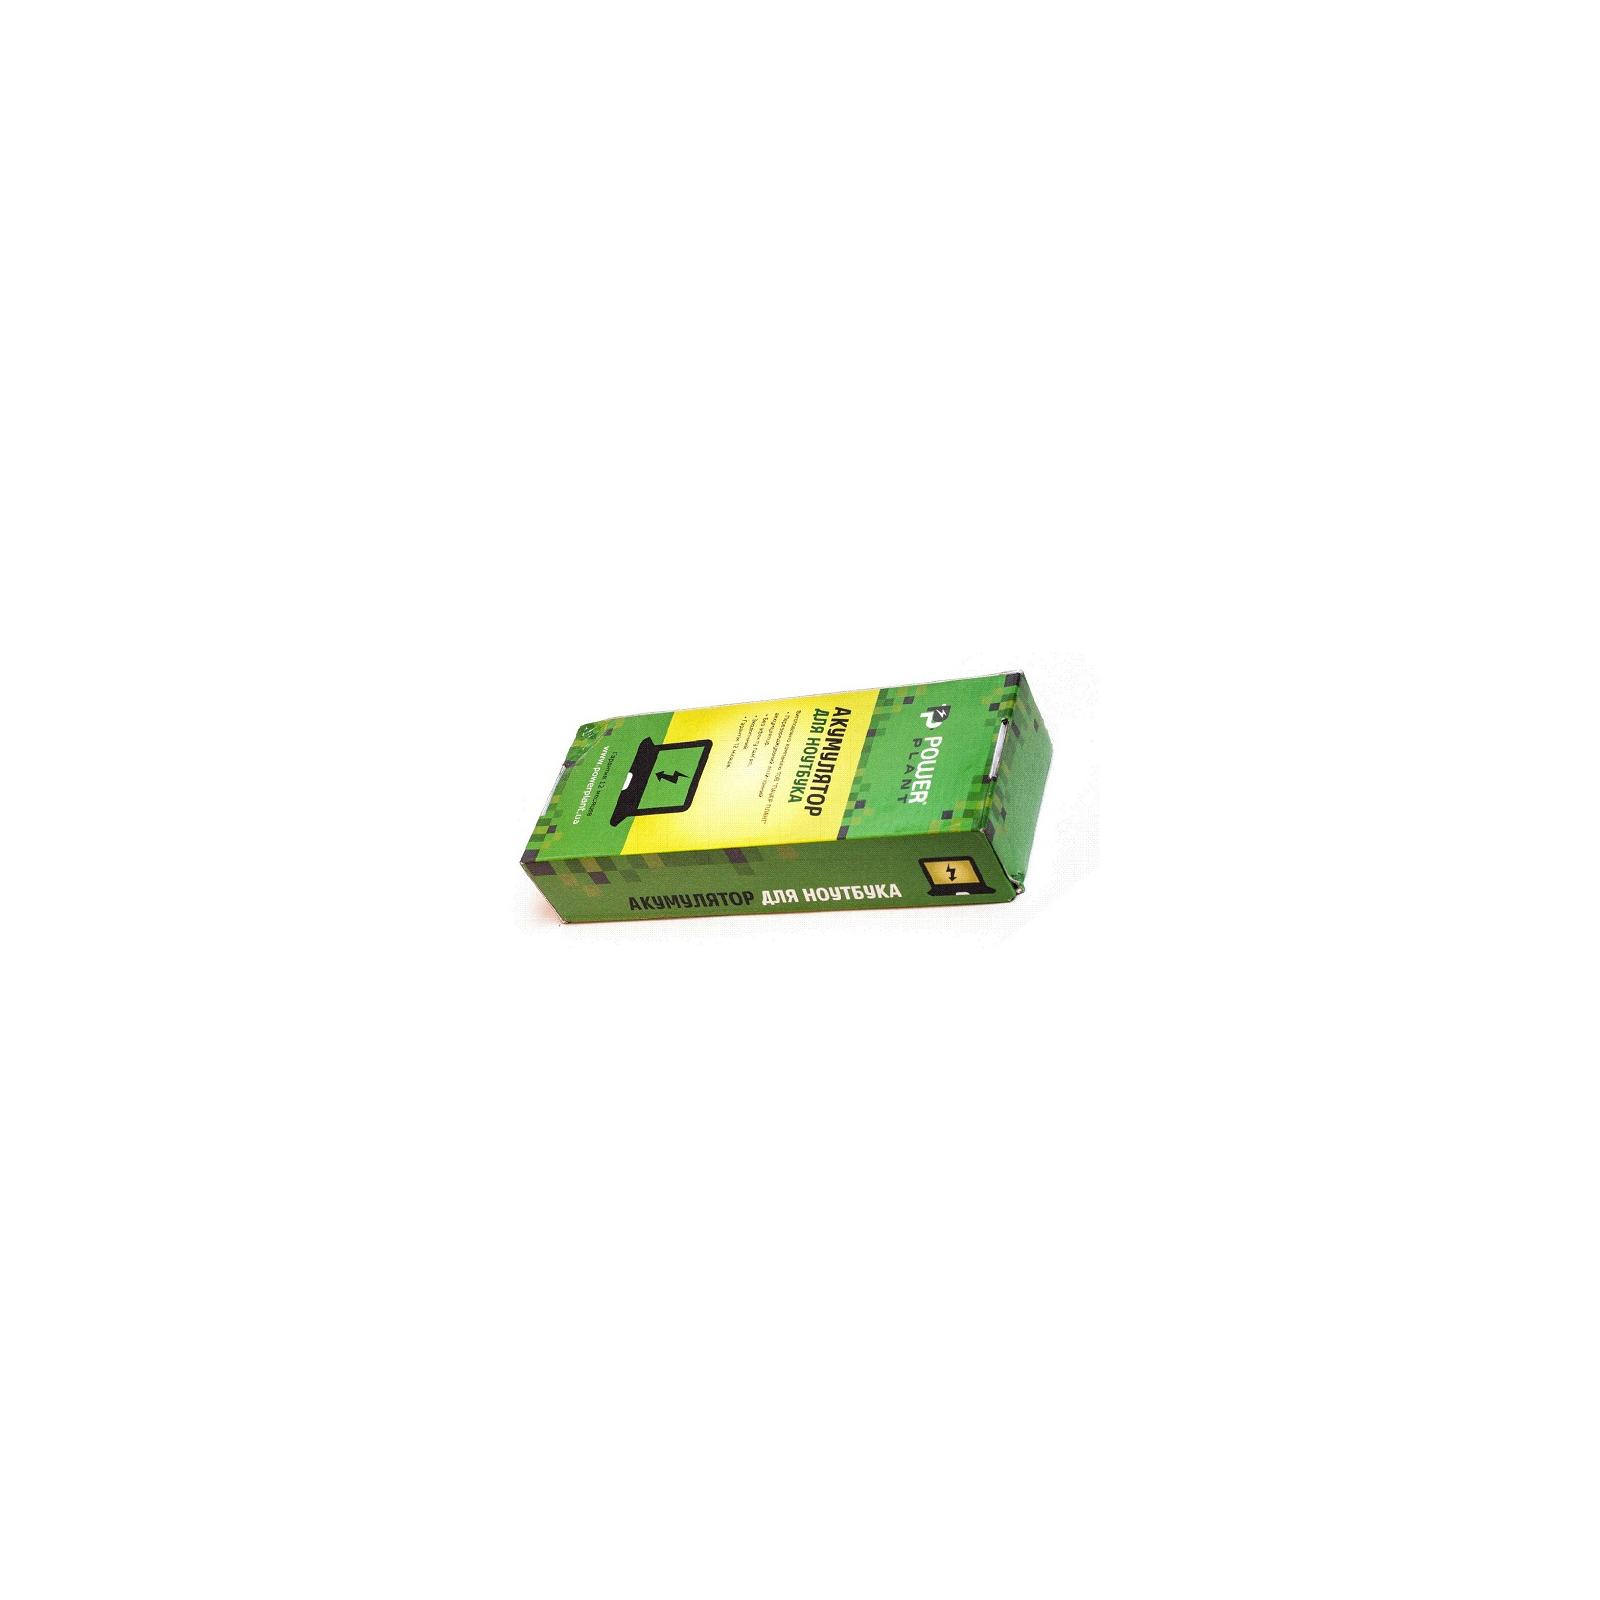 Аккумулятор для ноутбука TOSHIBA Satellite M40 (PA3399-1BAS,TO33993S2P) 10.8V 5200mAh PowerPlant (NB00000008) изображение 3